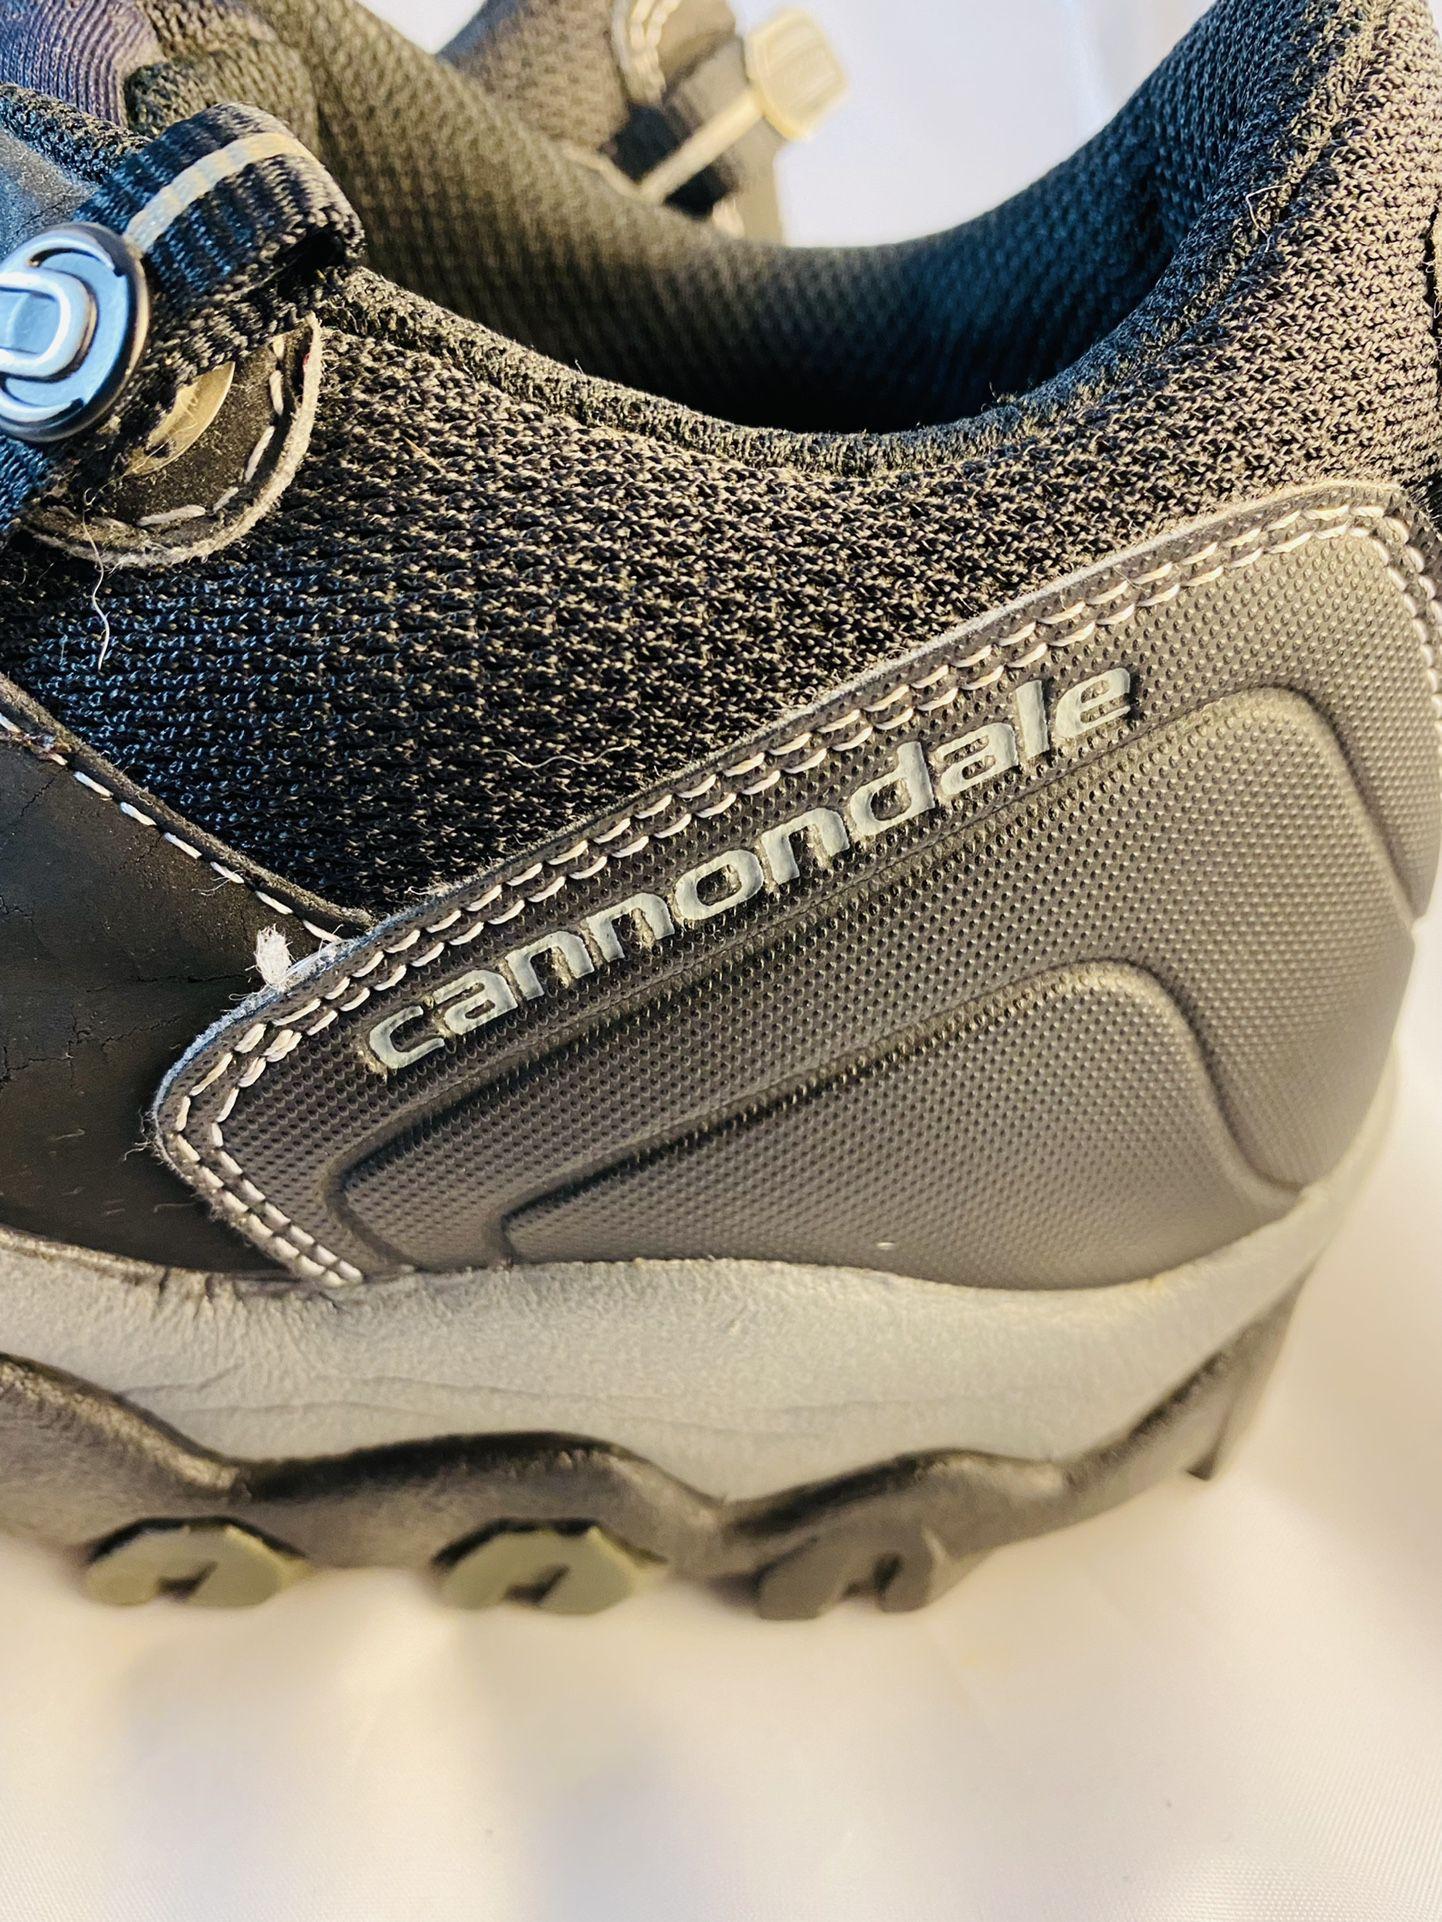 Cannondale Mountain Bike MTB Cycling Shoes Mens US 12 M Blue 2 Bolt Lace U